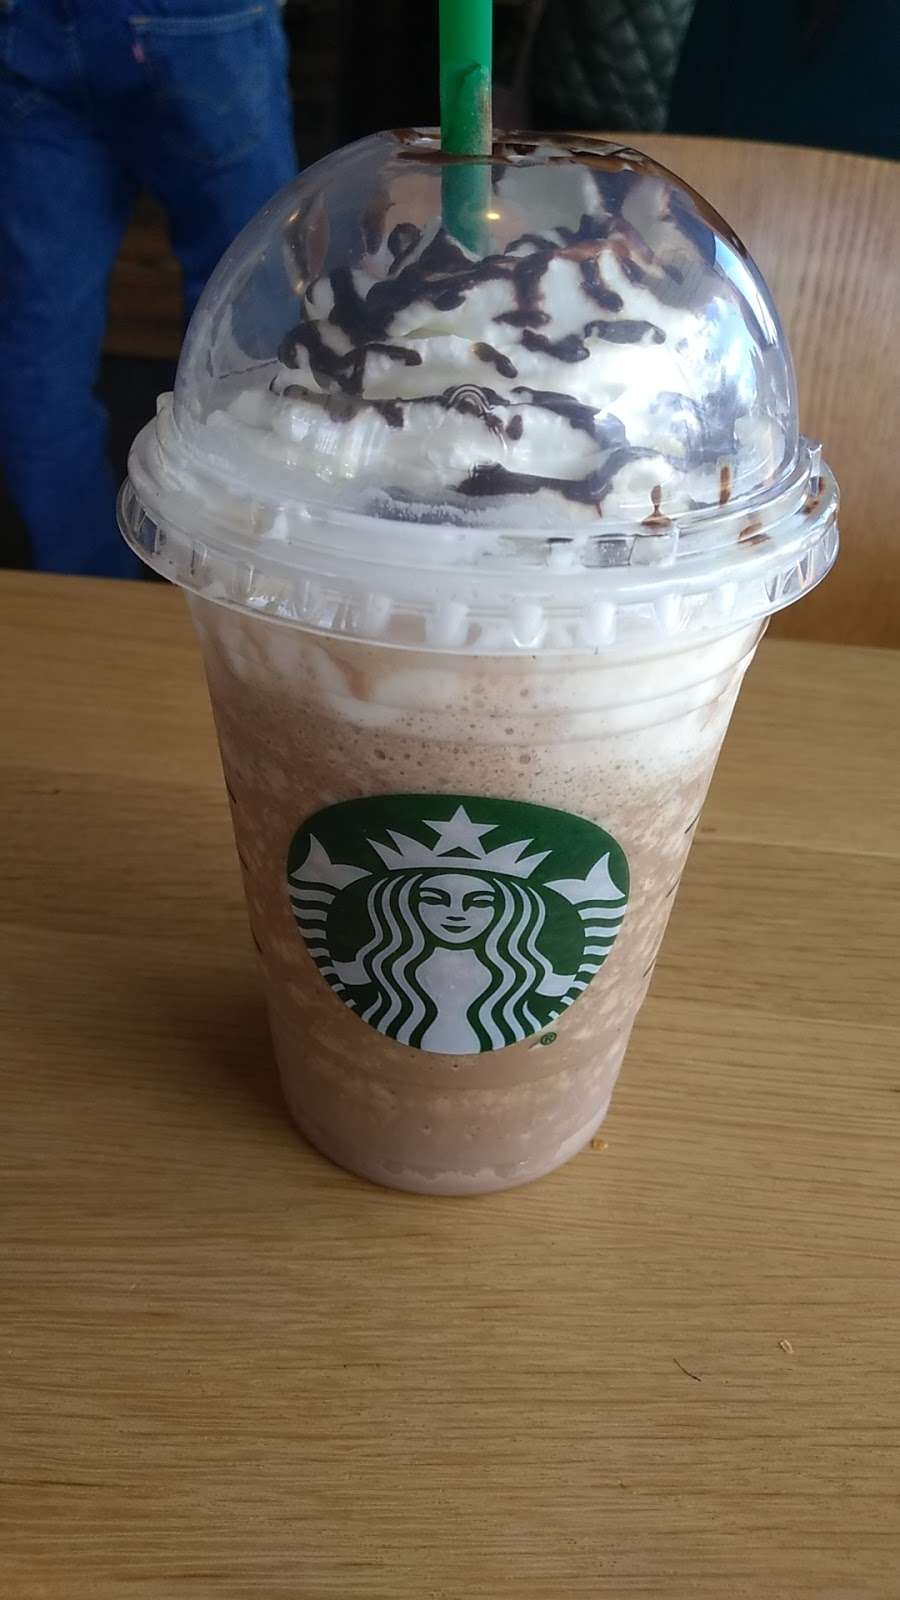 Starbucks - cafe  | Photo 7 of 10 | Address: 12447 Hedges Run Dr #B-1, Lake Ridge, VA 22192, USA | Phone: (703) 491-9055